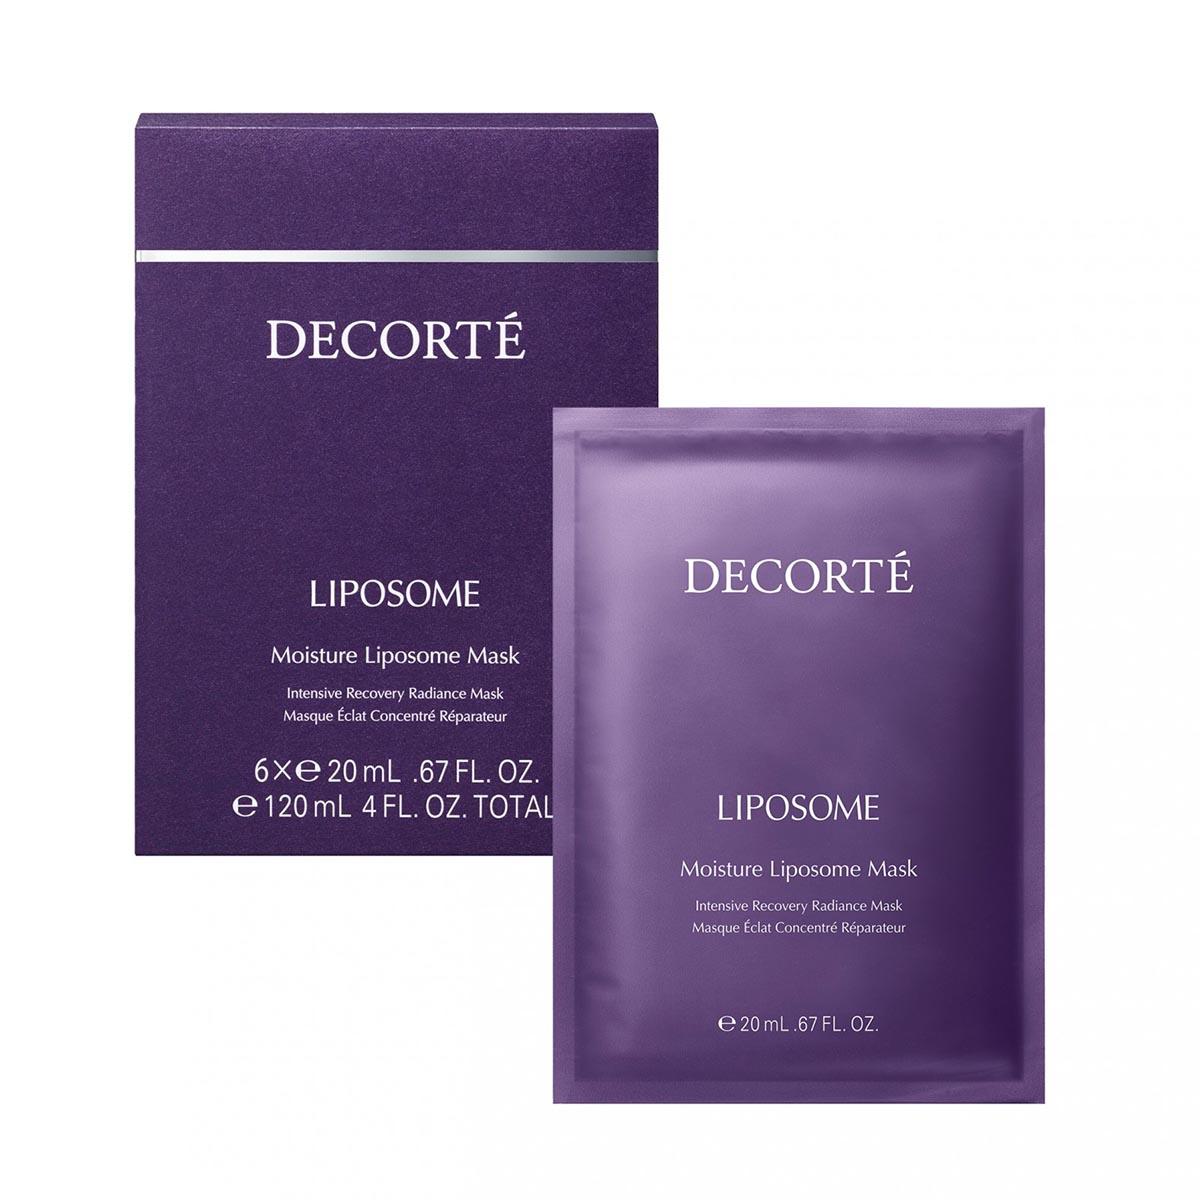 Decorte liposome moisturizing mask 20x6ml